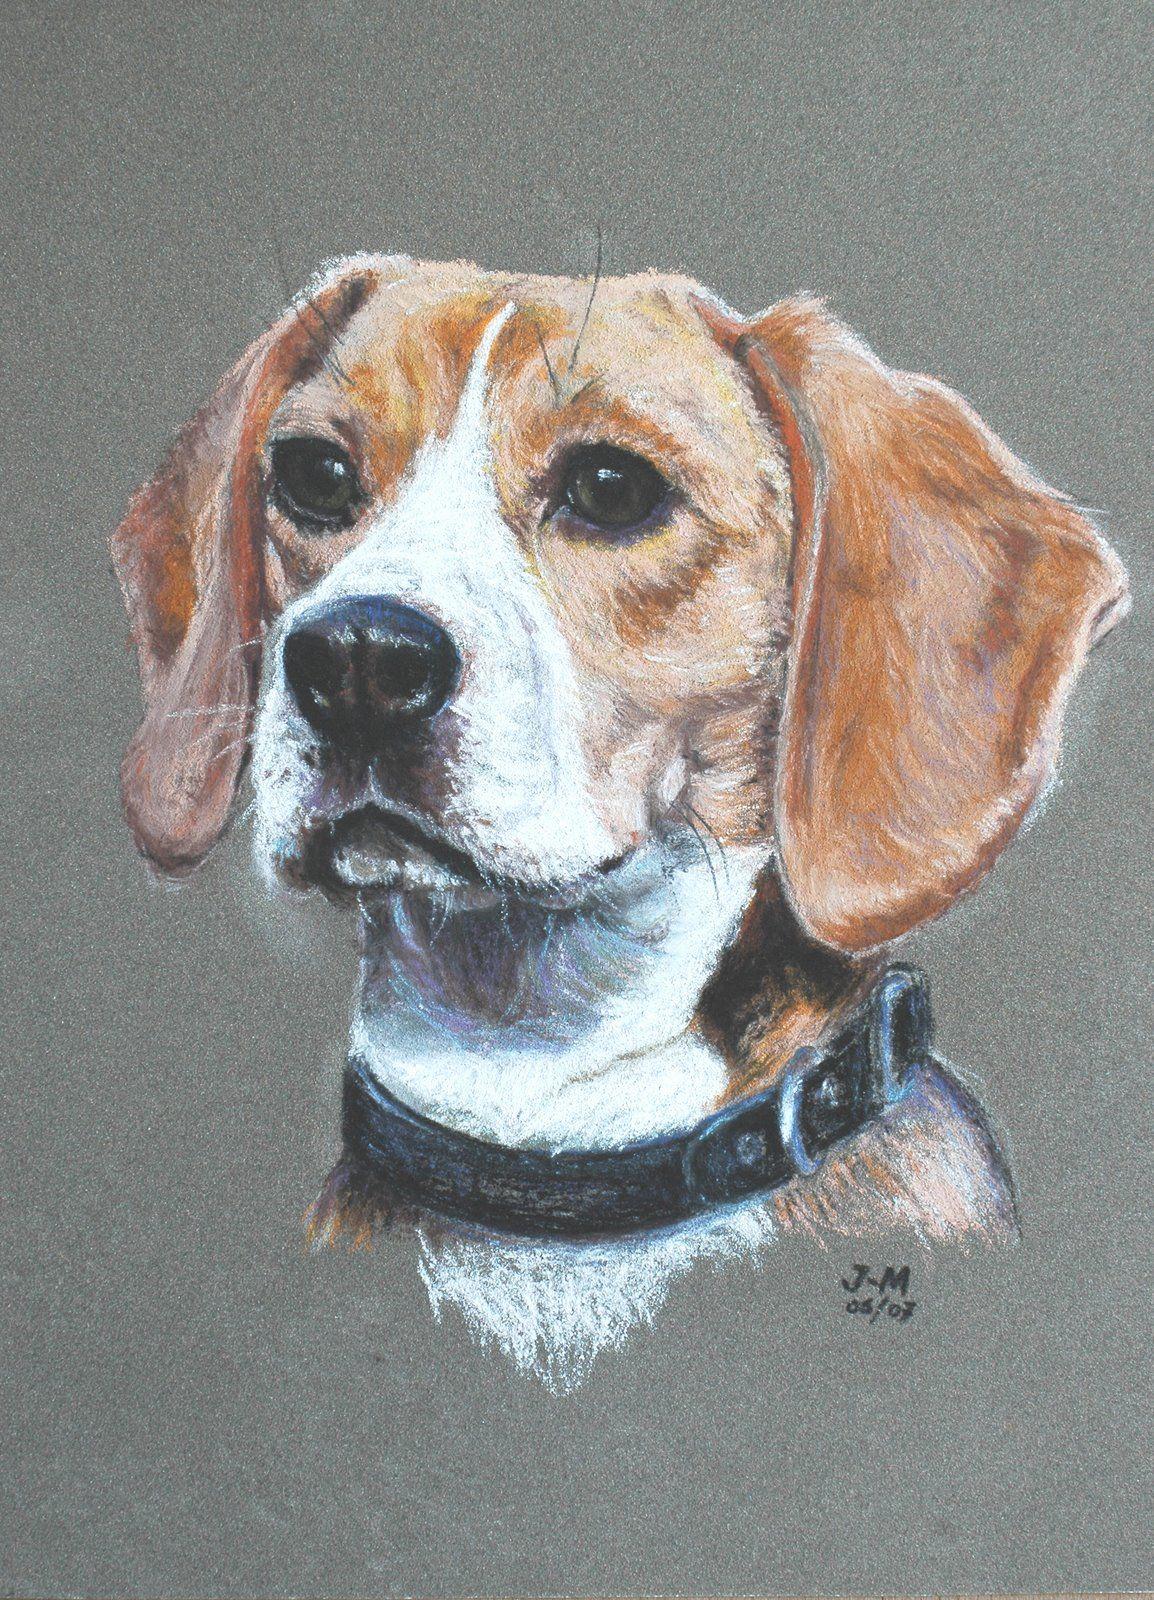 Dogtv Stimulation The Busy Dog Walker Beagle Planet Beagle Art Beagle Pictures Paw Art